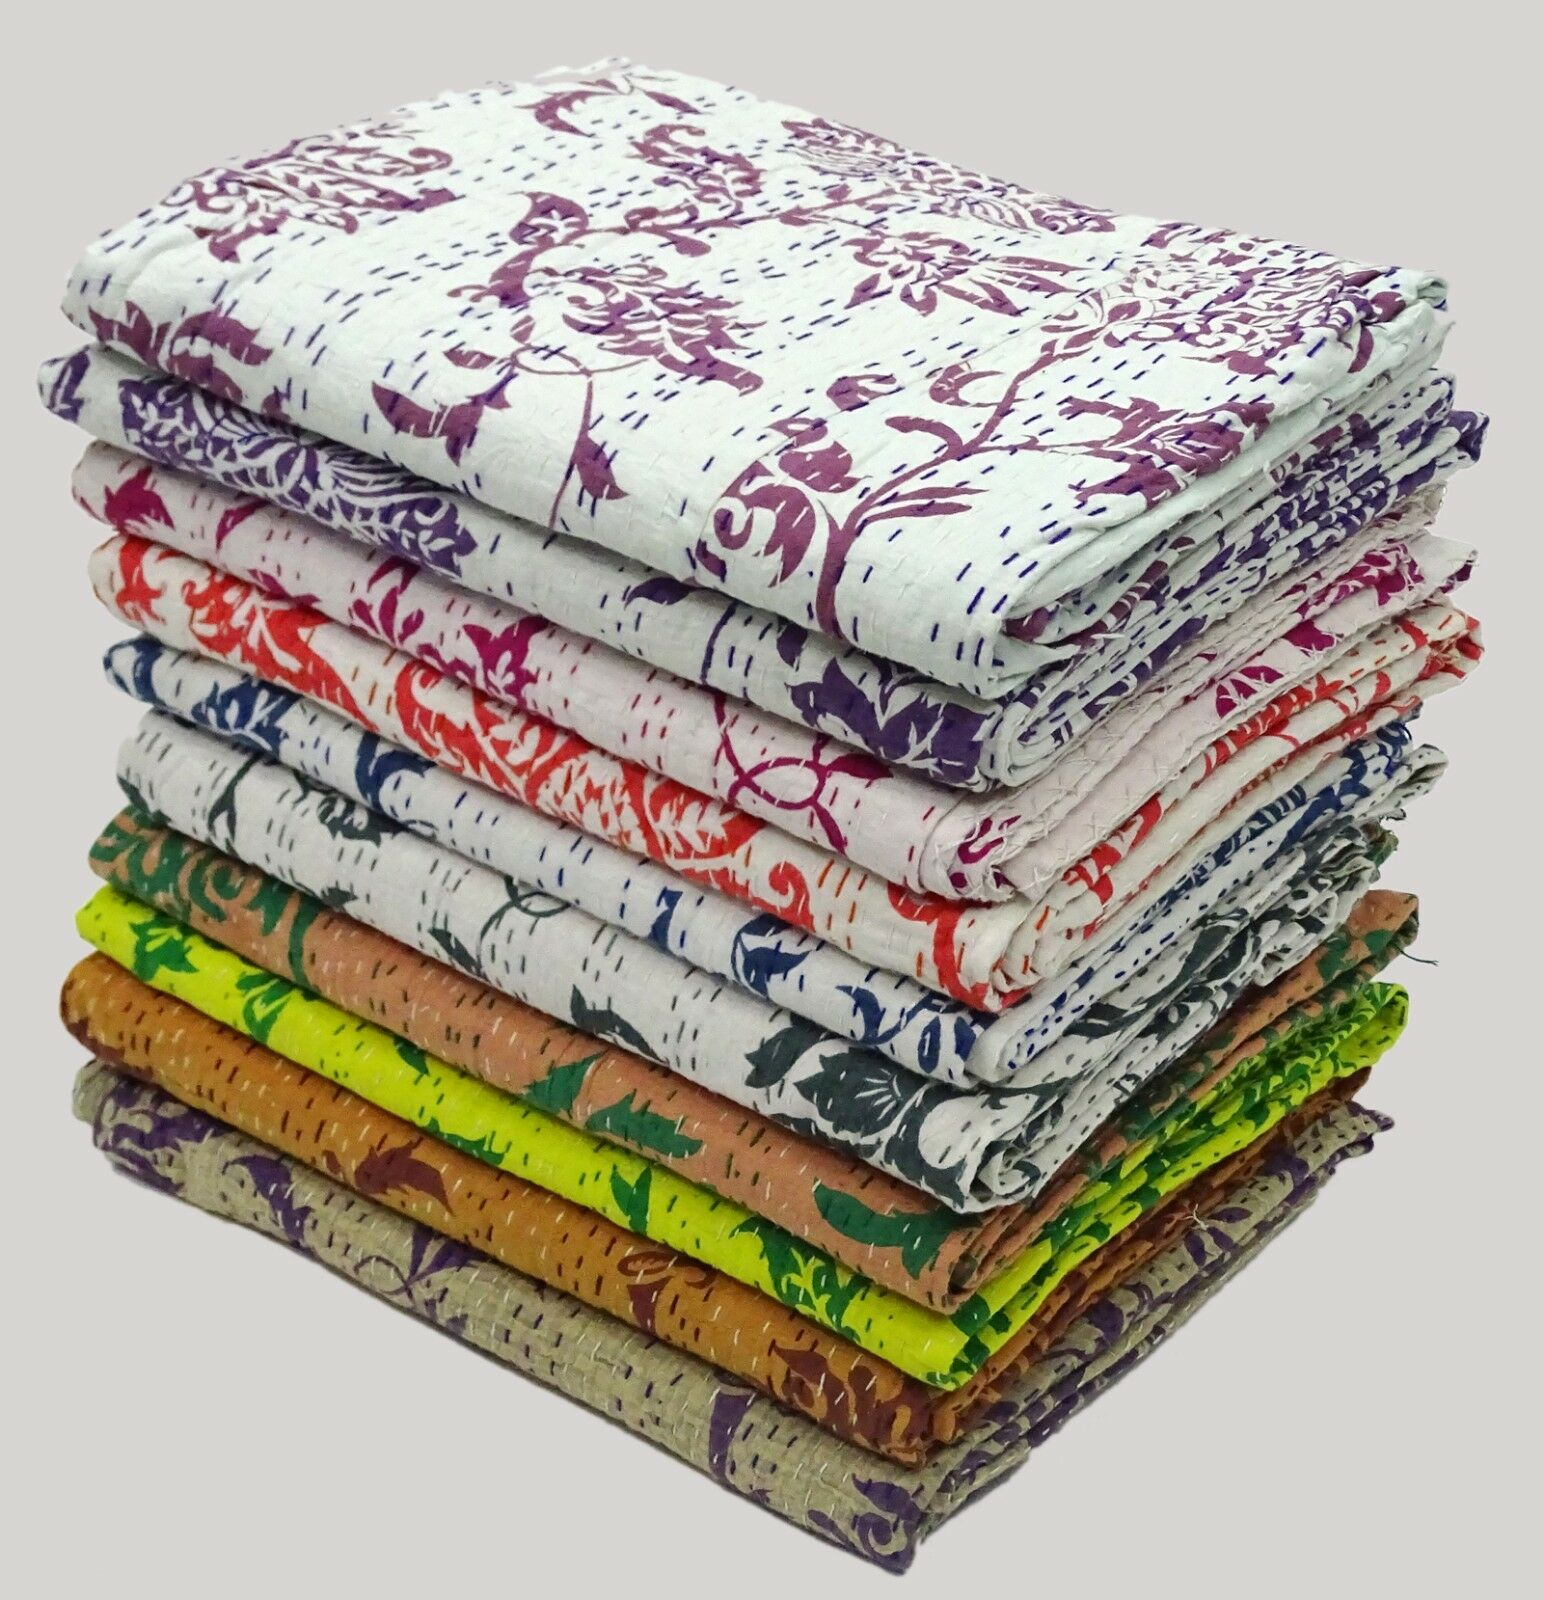 25Pc Lot Kantha Quilt Single Size Lotus Print Bedsheet Handmade Cotton Bedspread